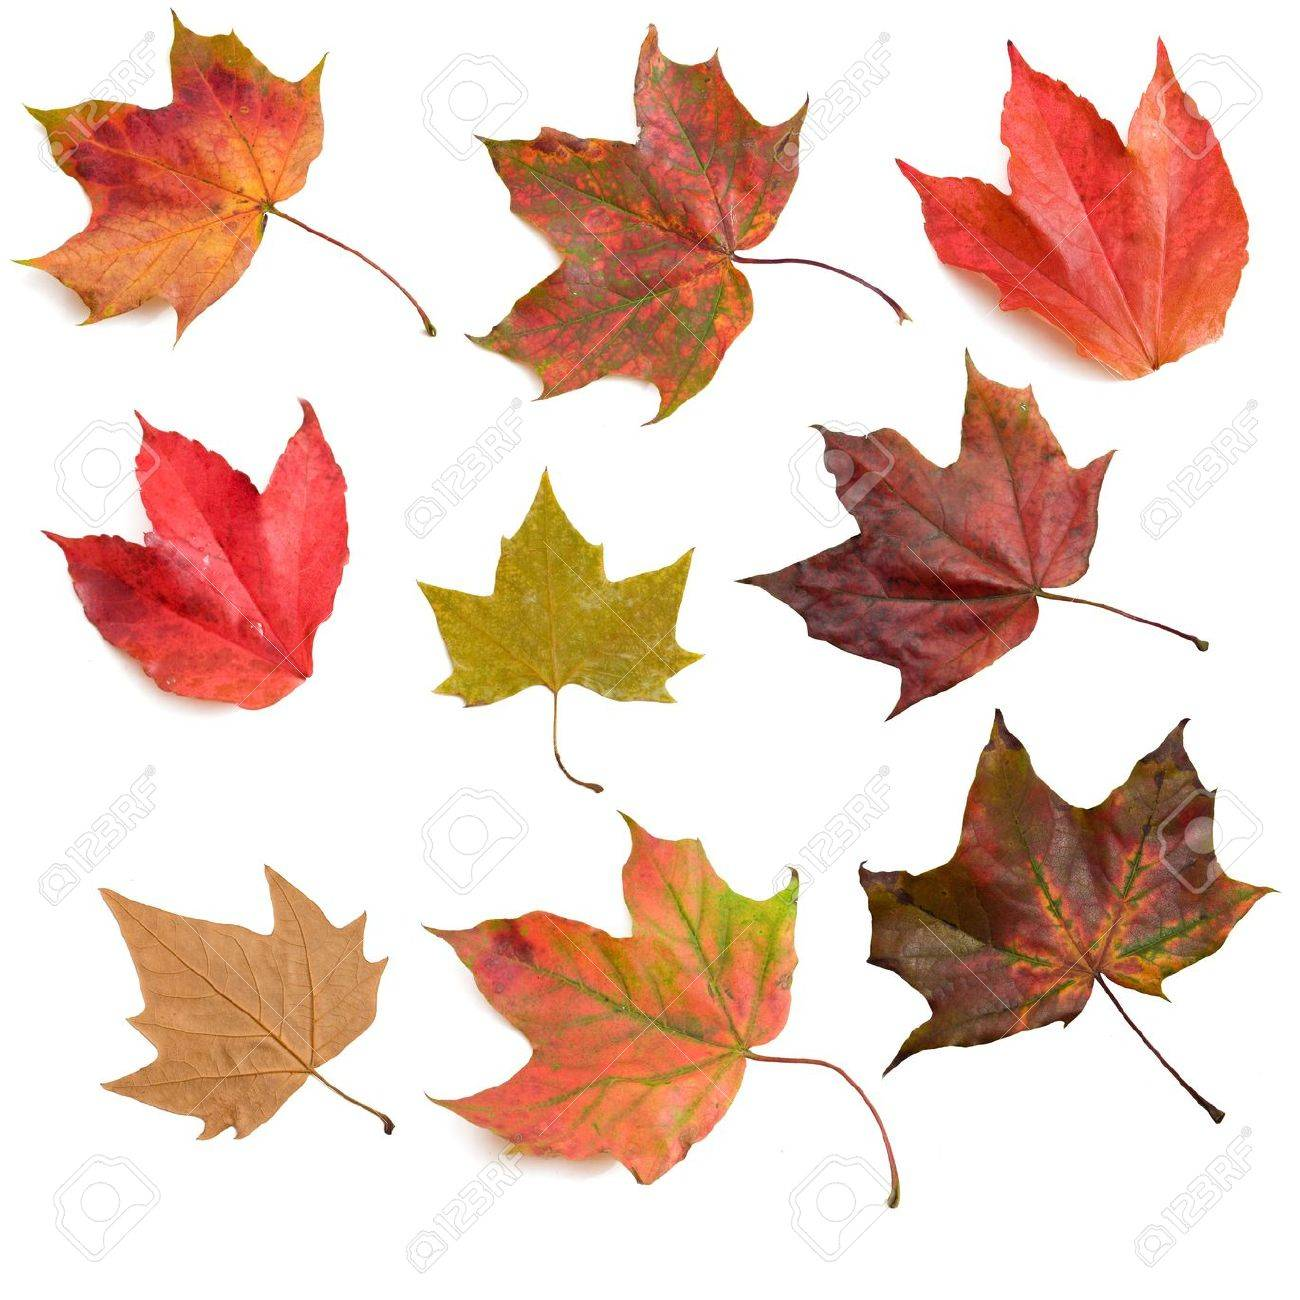 Set of autumn leaves Stock Photo - 5676369